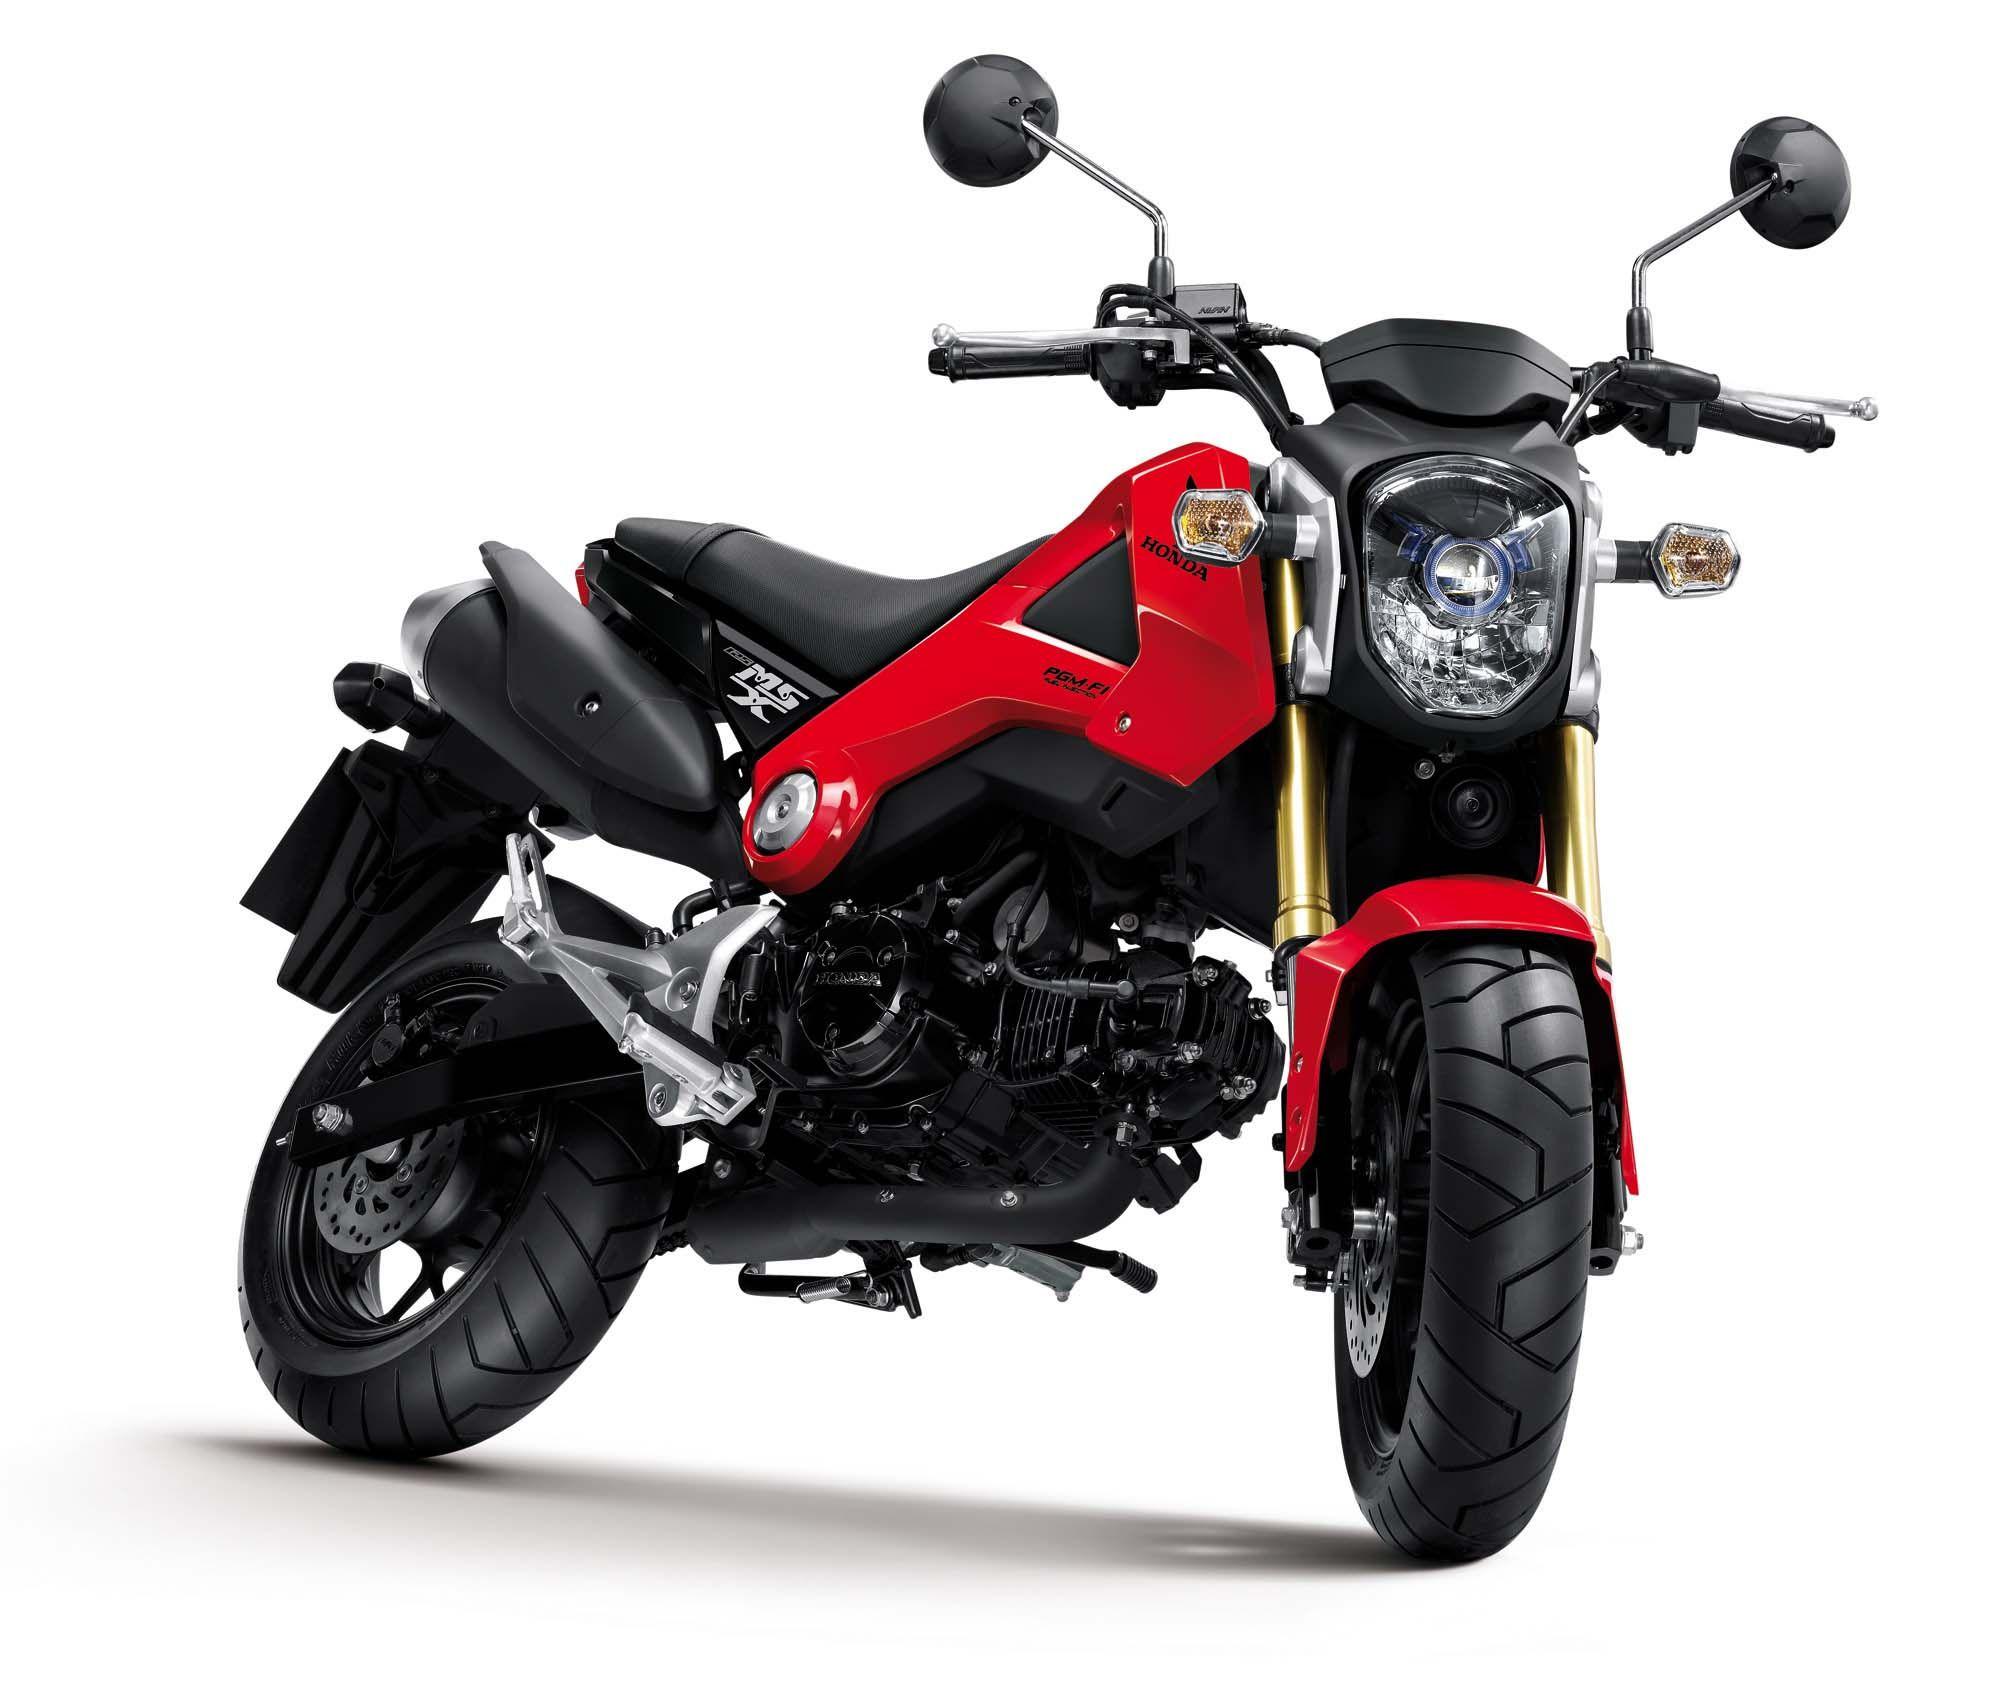 Honda Msx125 Will Make A Monkey Out Of You Honda Msx 125 Honda